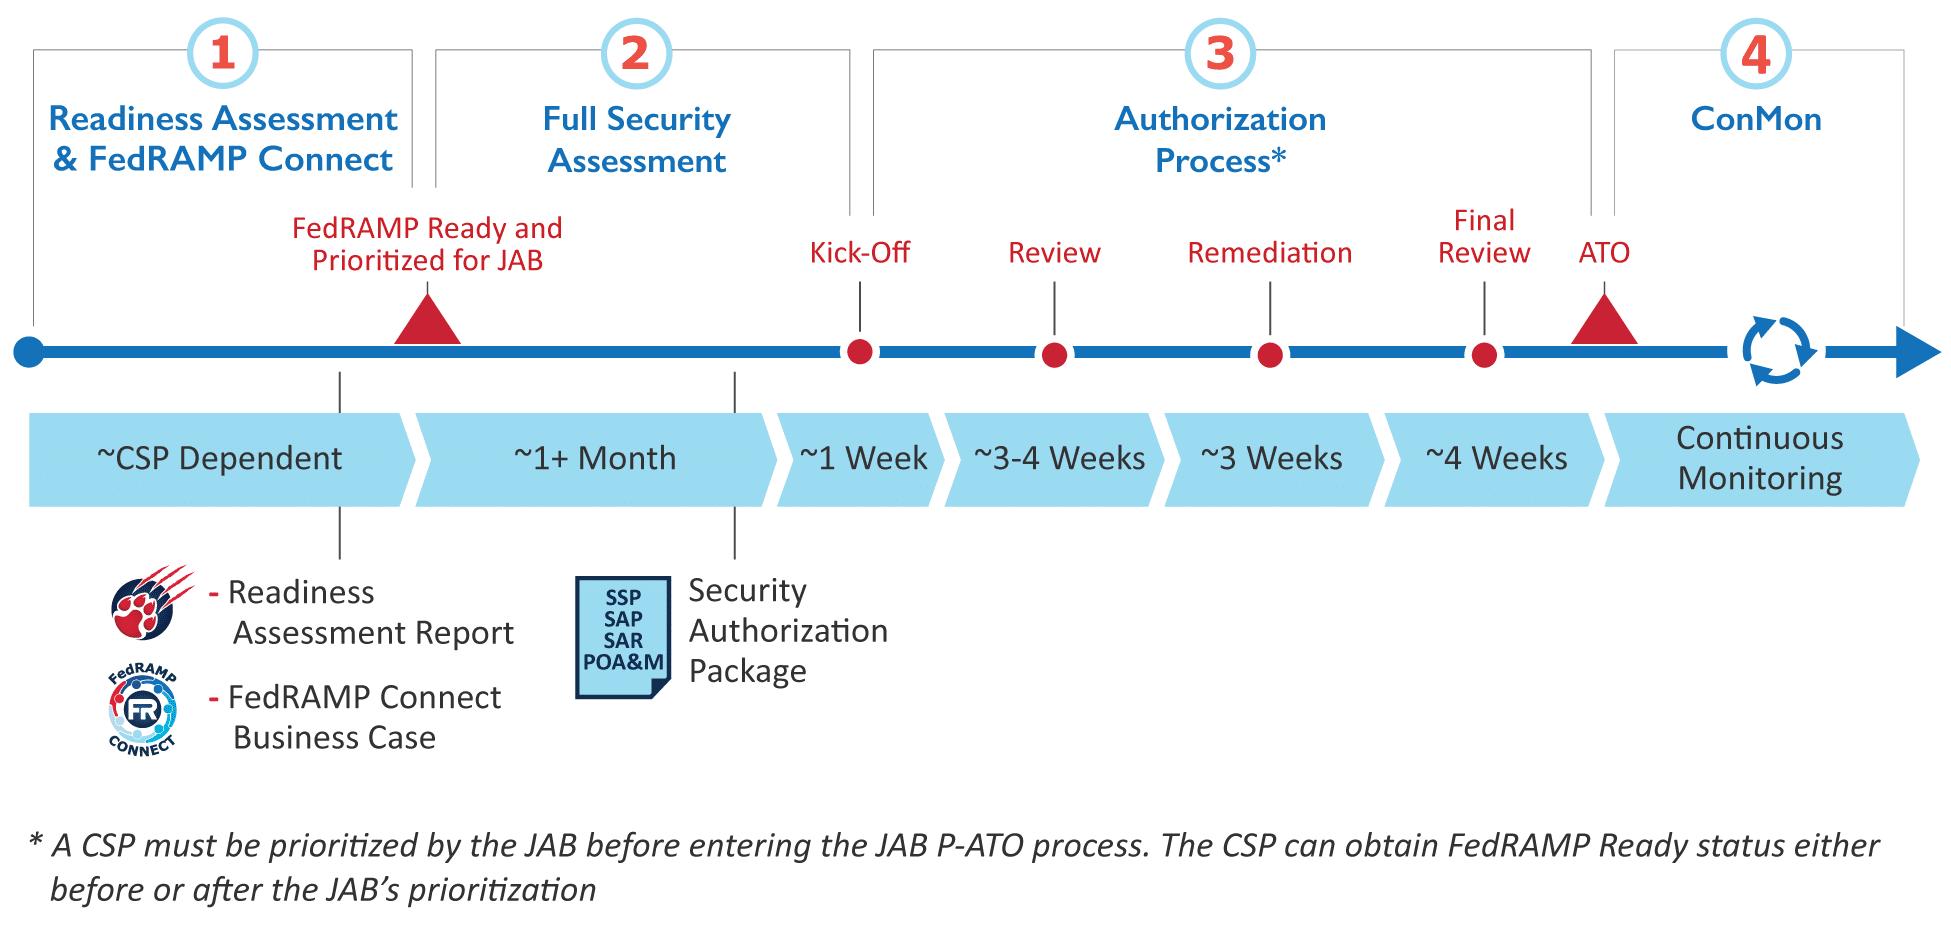 4-step JAB process for FedRAMP